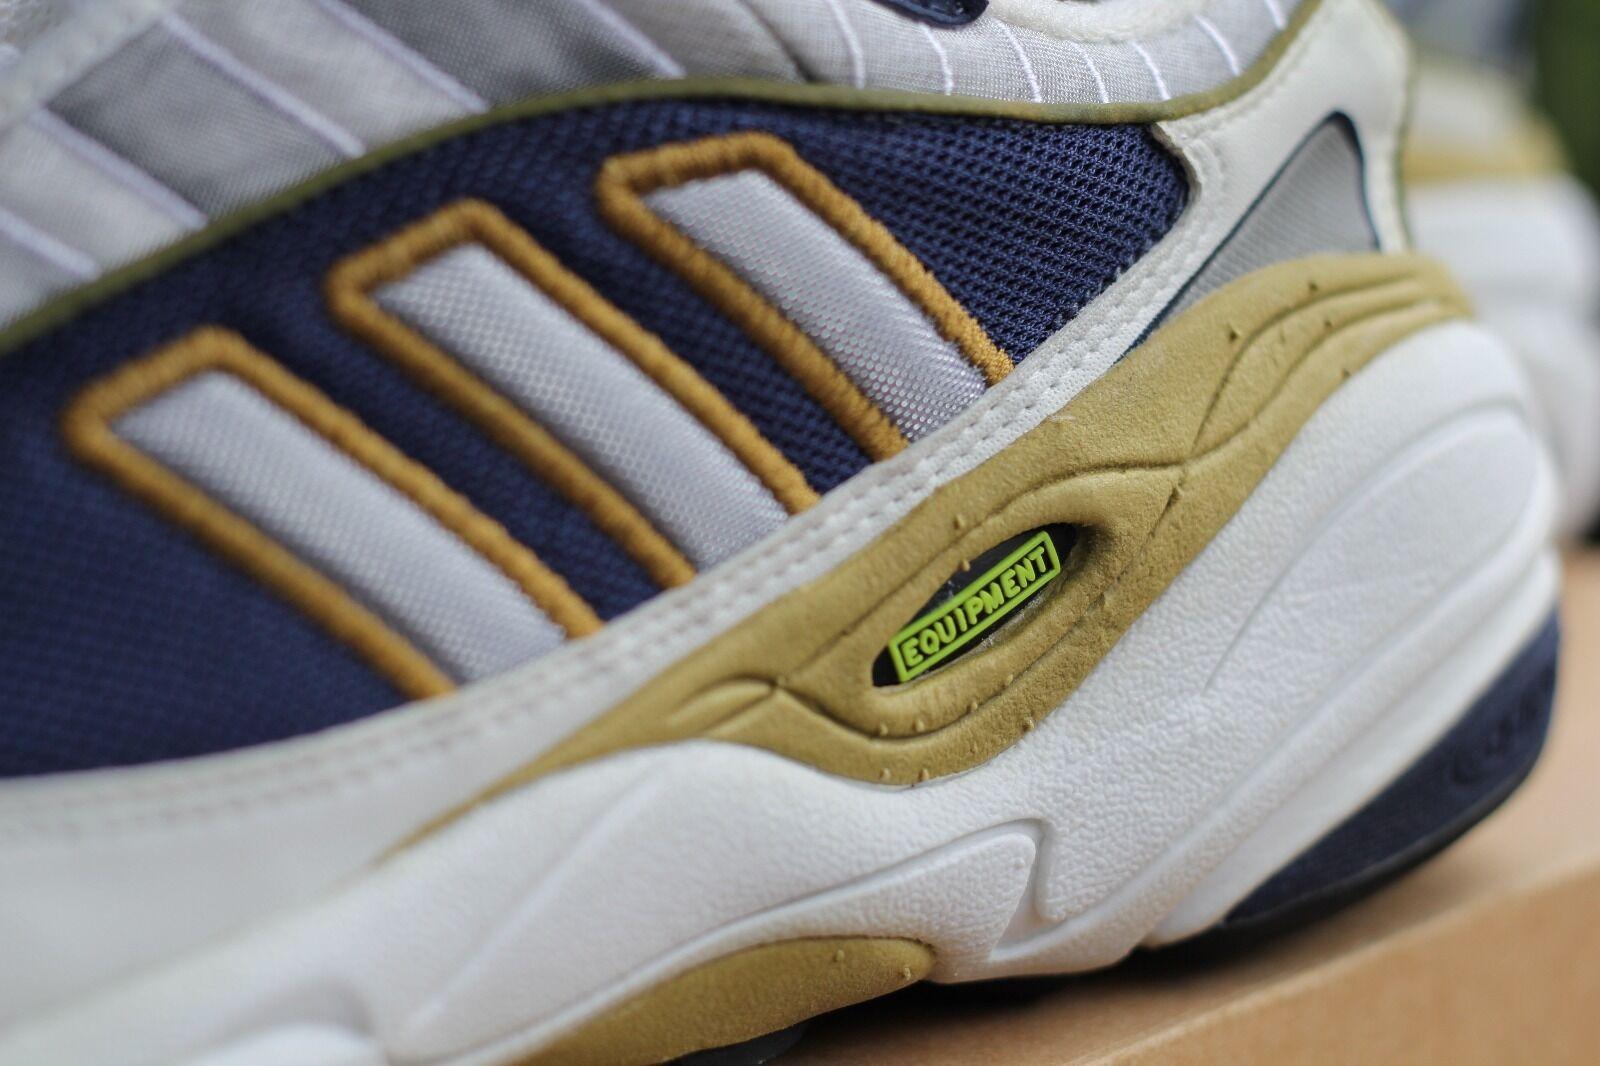 the best attitude a7edf e871f 1998 ADIDAS EQUIPMENT Tyranny Shoes (Feet You Wear) 10.0 Usa -  1,987.00    PicClick